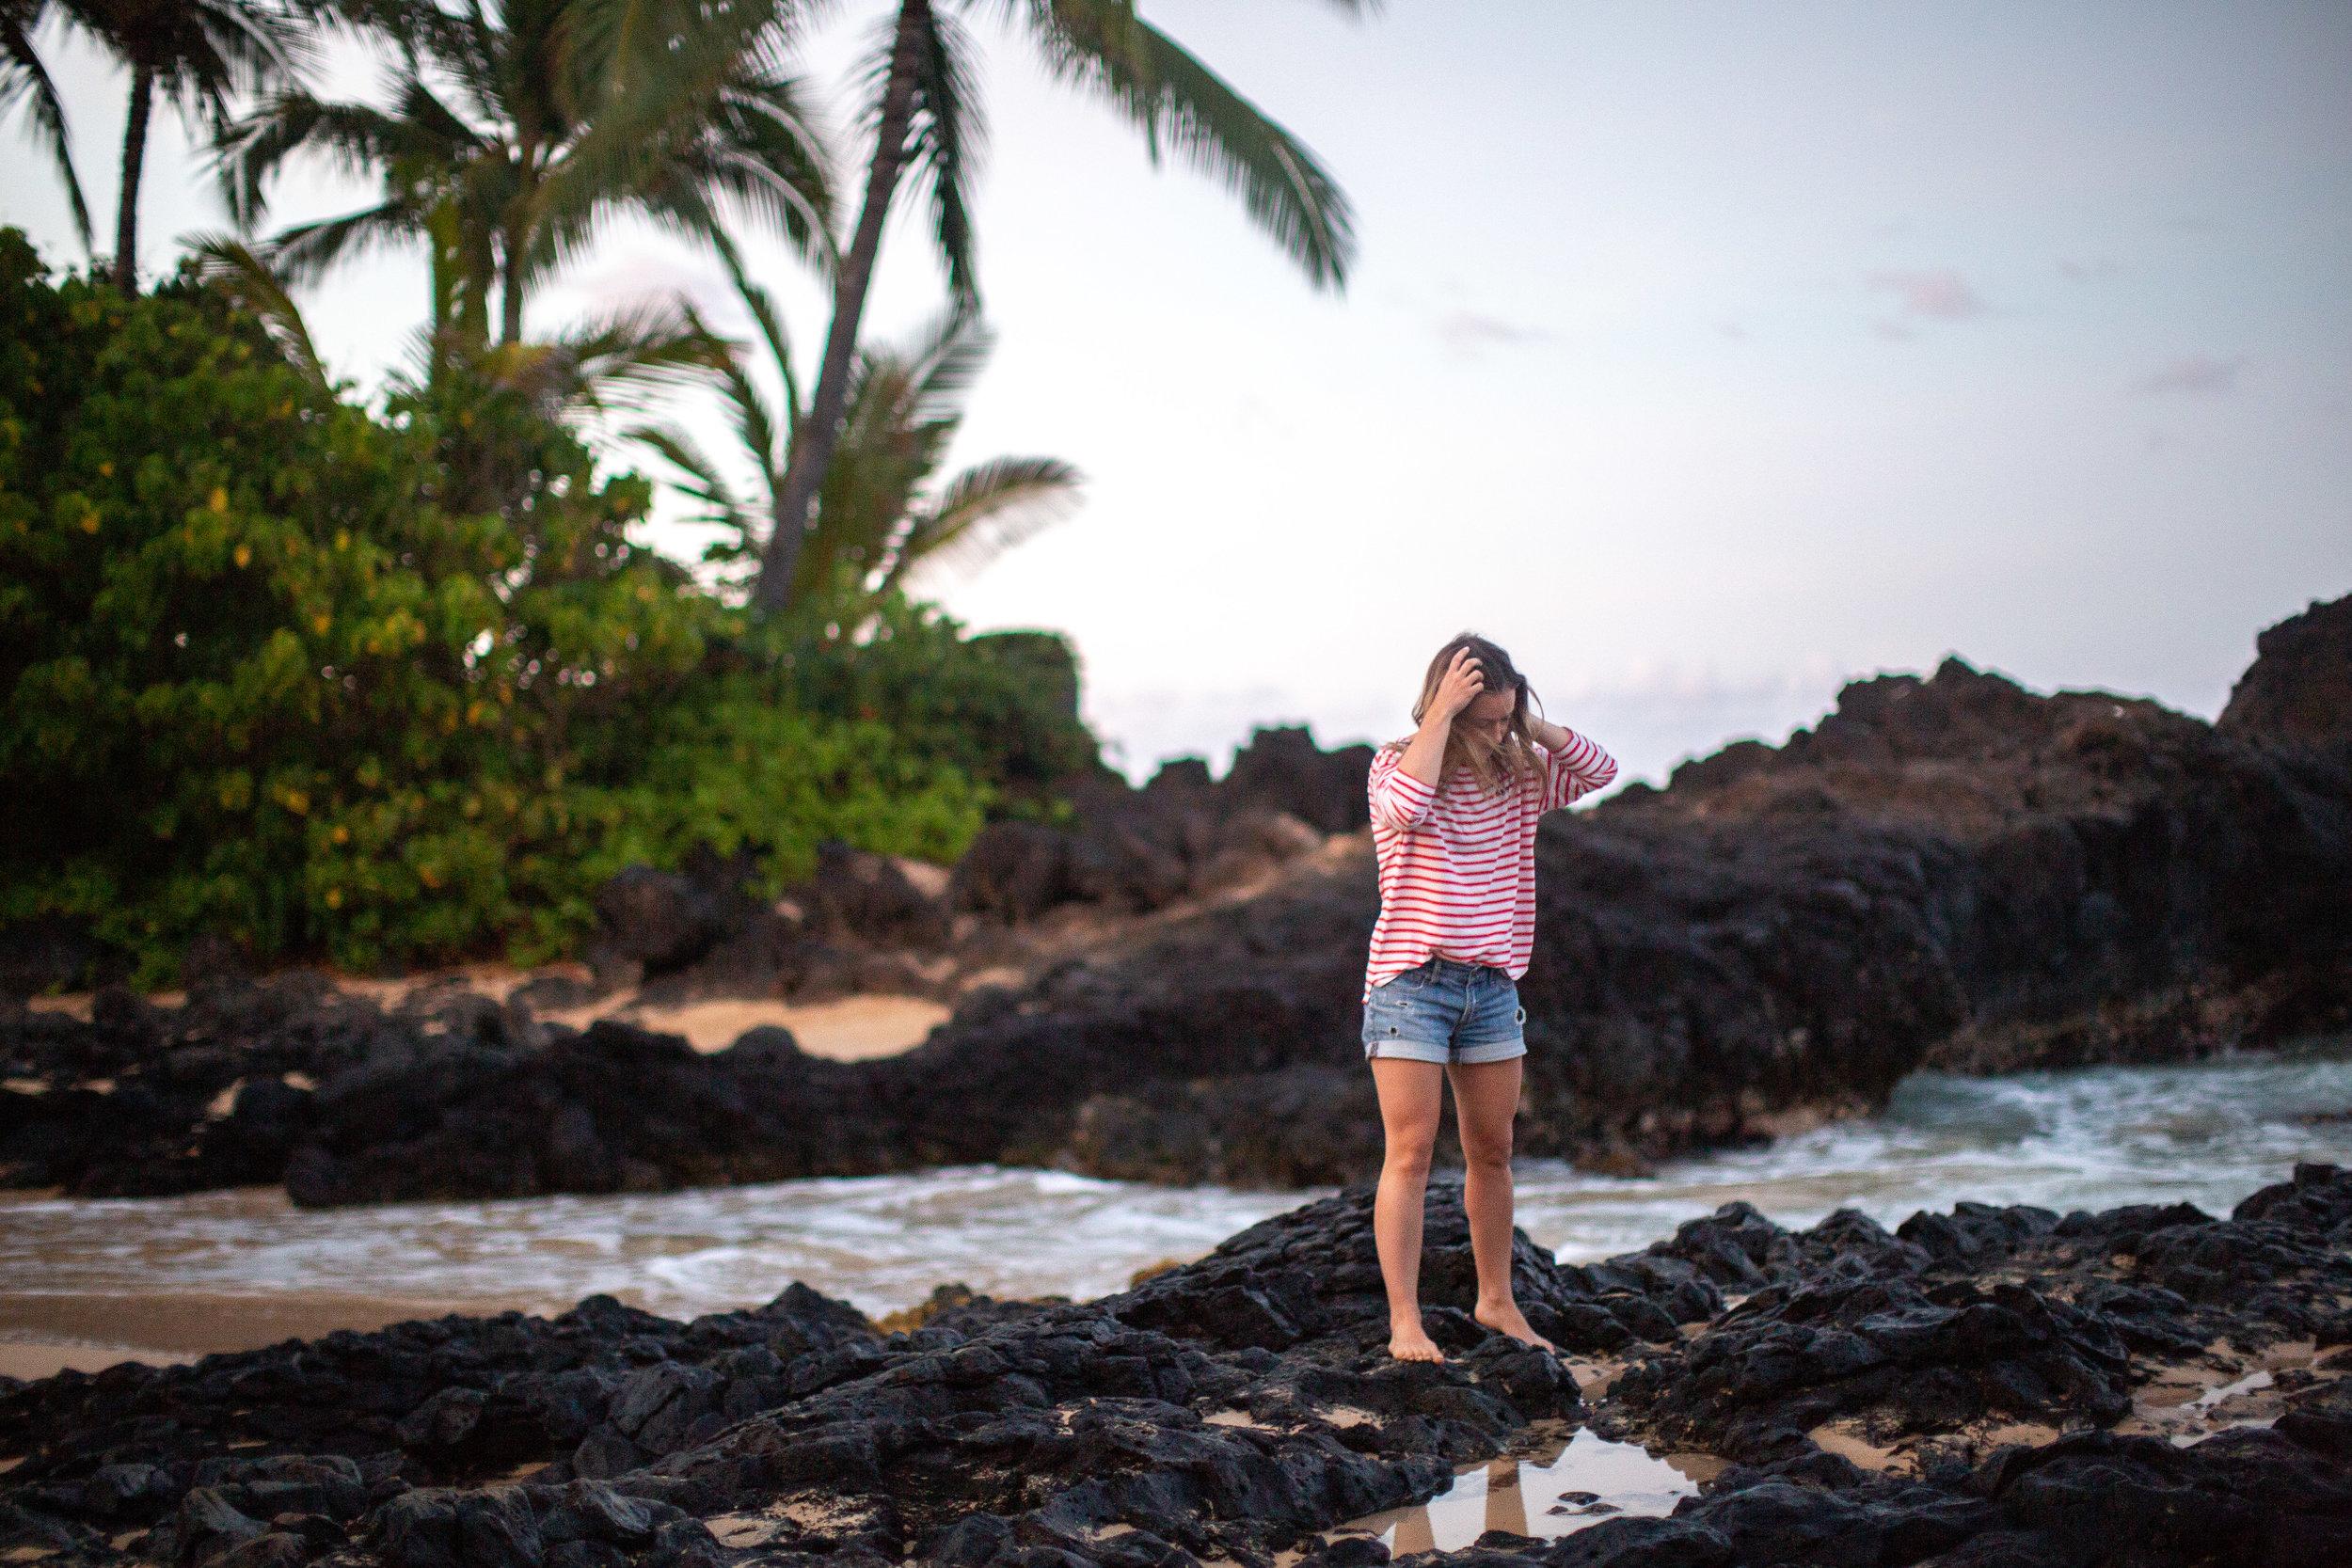 fizz-fade-hawaii-sunrise-stripes2-19.jpg